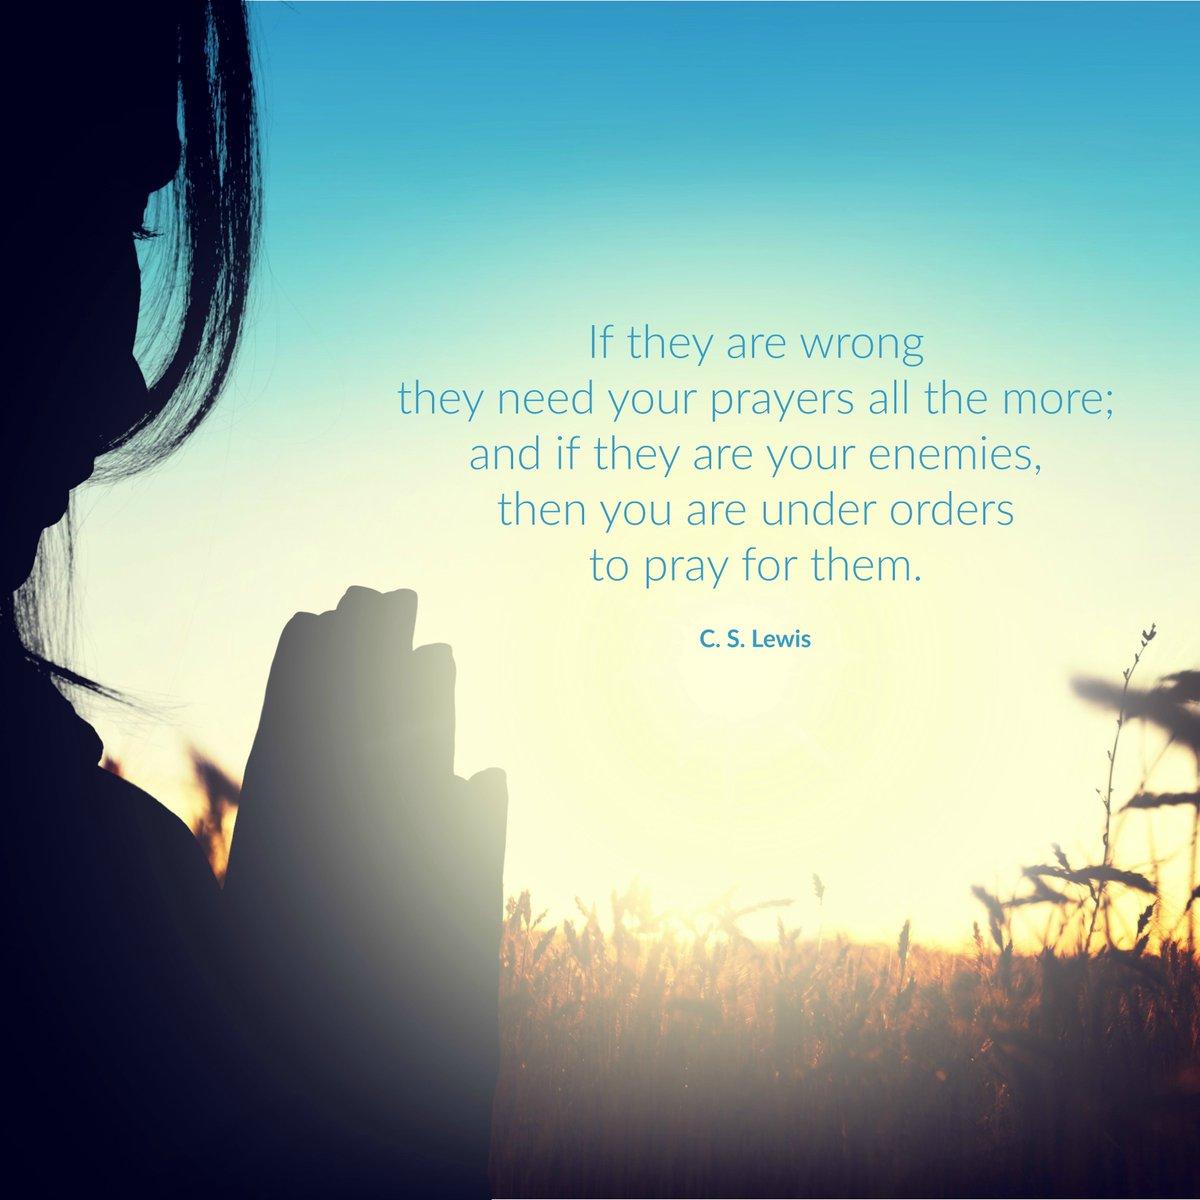 #CSLewis #Prayer